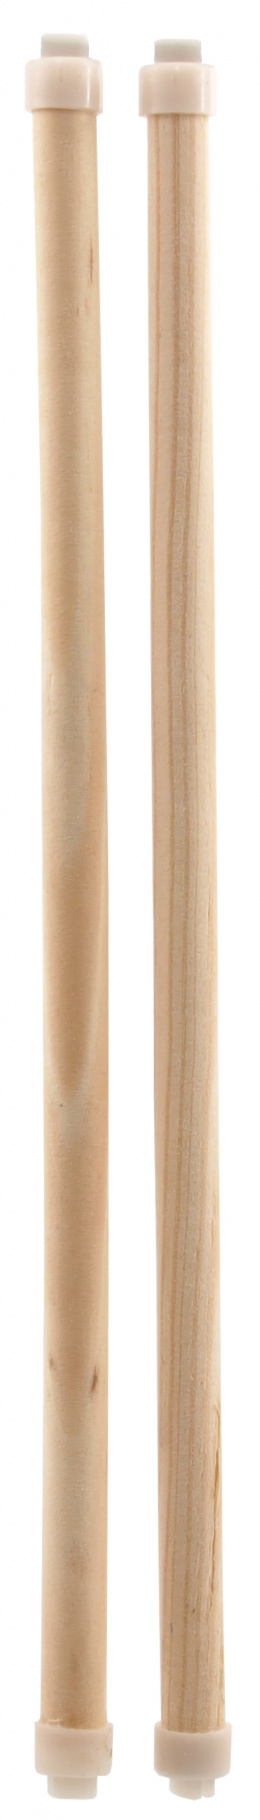 Деревянные жердочки для птиц - BIRD JEWEL  61 cm (2 шт)